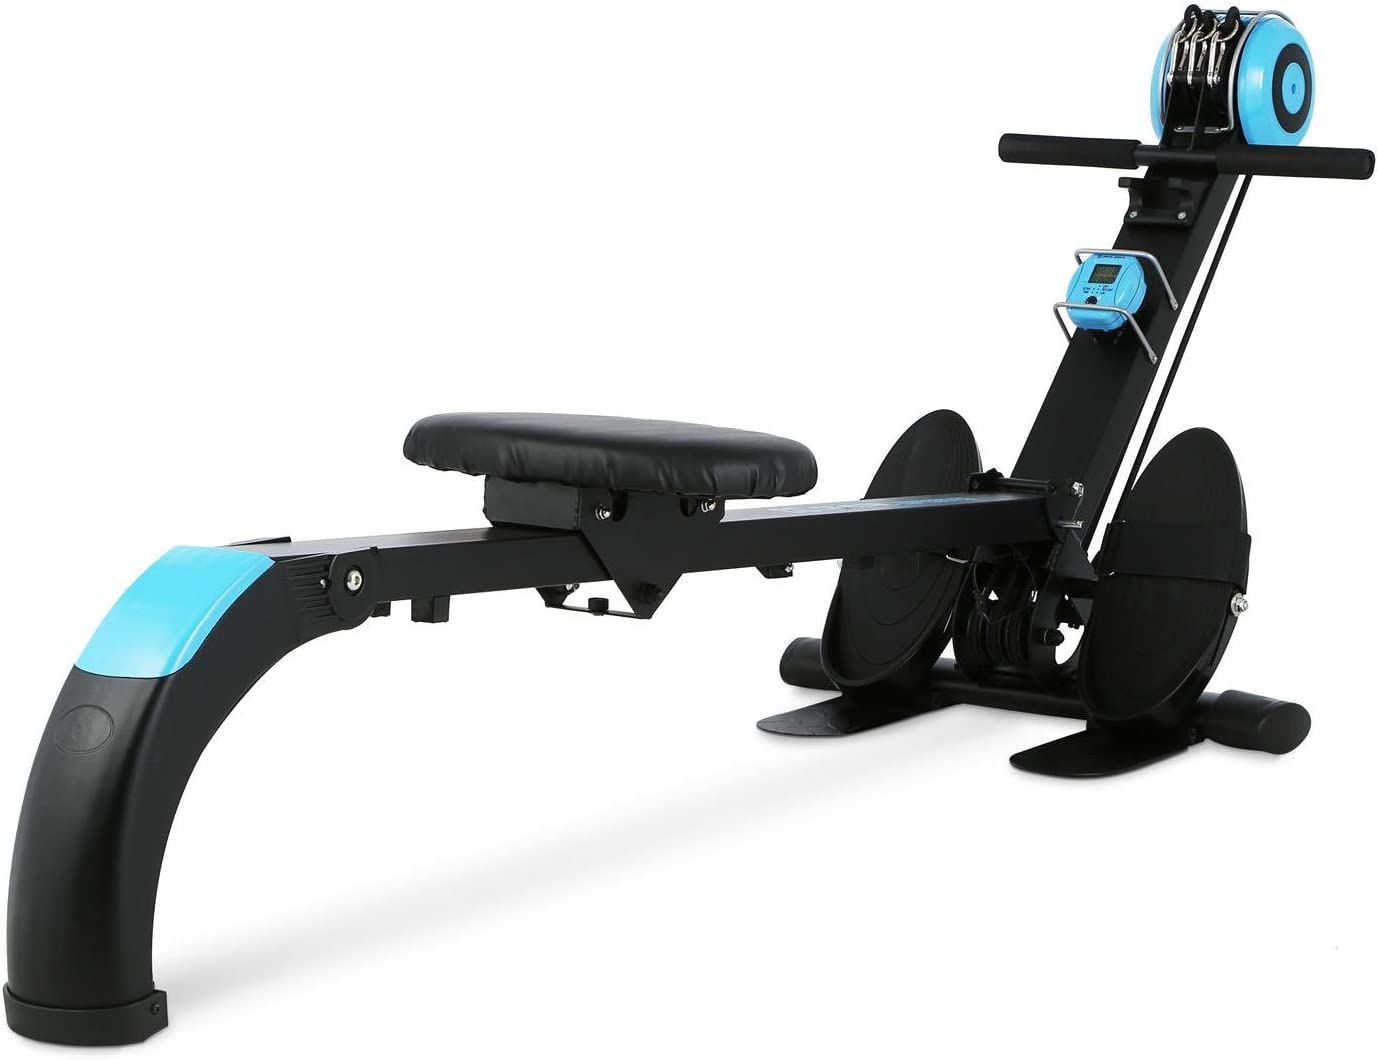 CapitalSports Capital Sports Stringmaster m/áquina Remo Banco Remo Plegable multifunci/ón 100kg Capacidad MAX